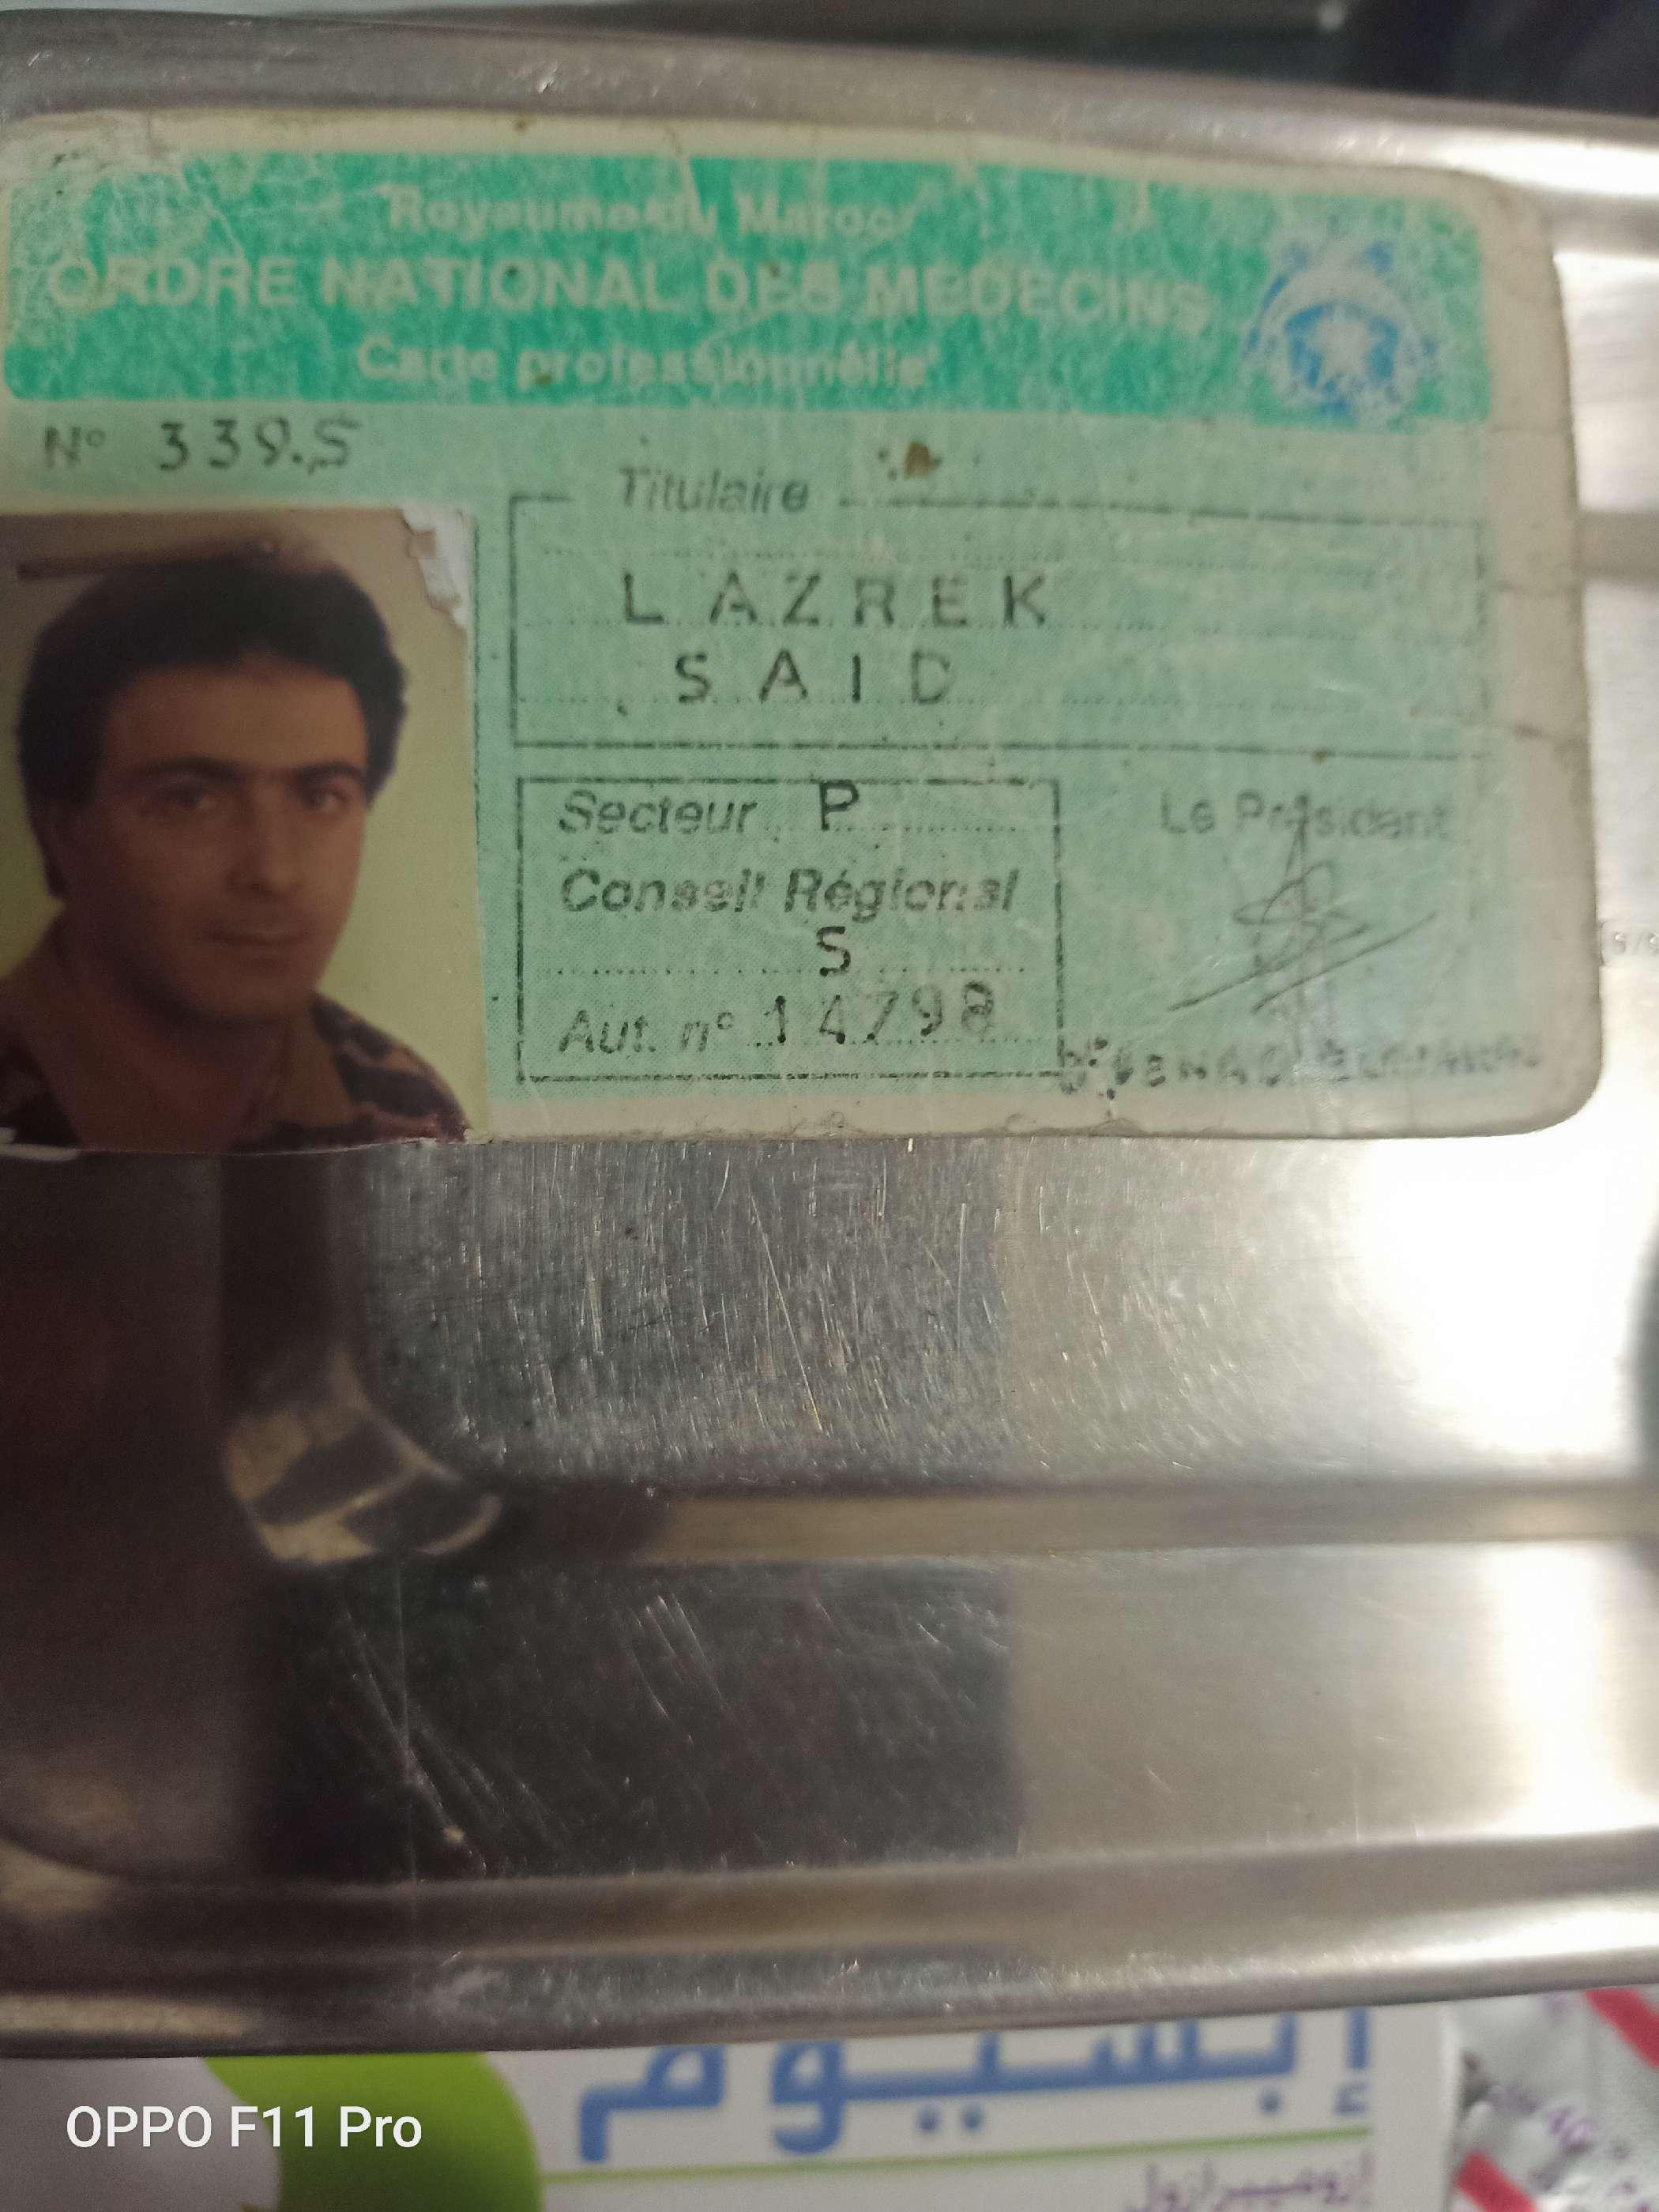 Dr. Said Lazrek